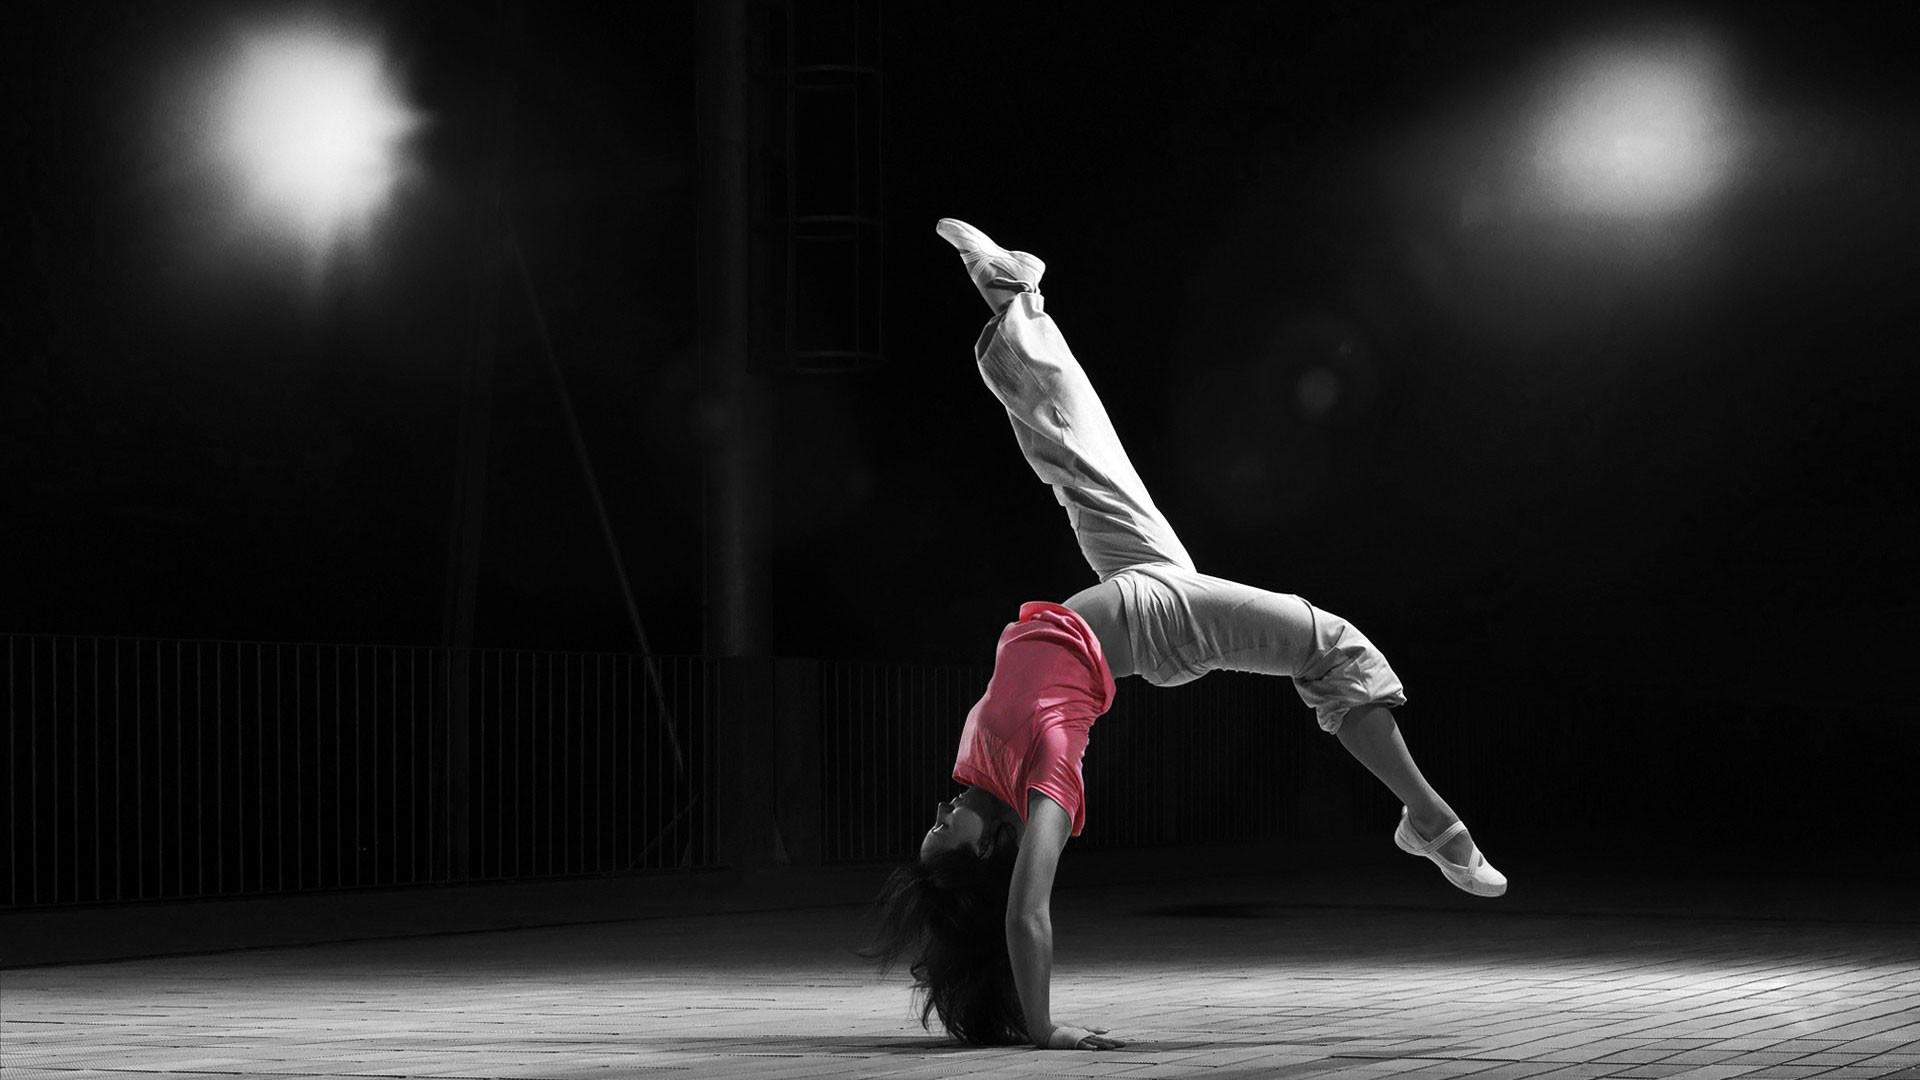 hd pics photos best fitness girl training dance hd quality desktop  background wallpaper